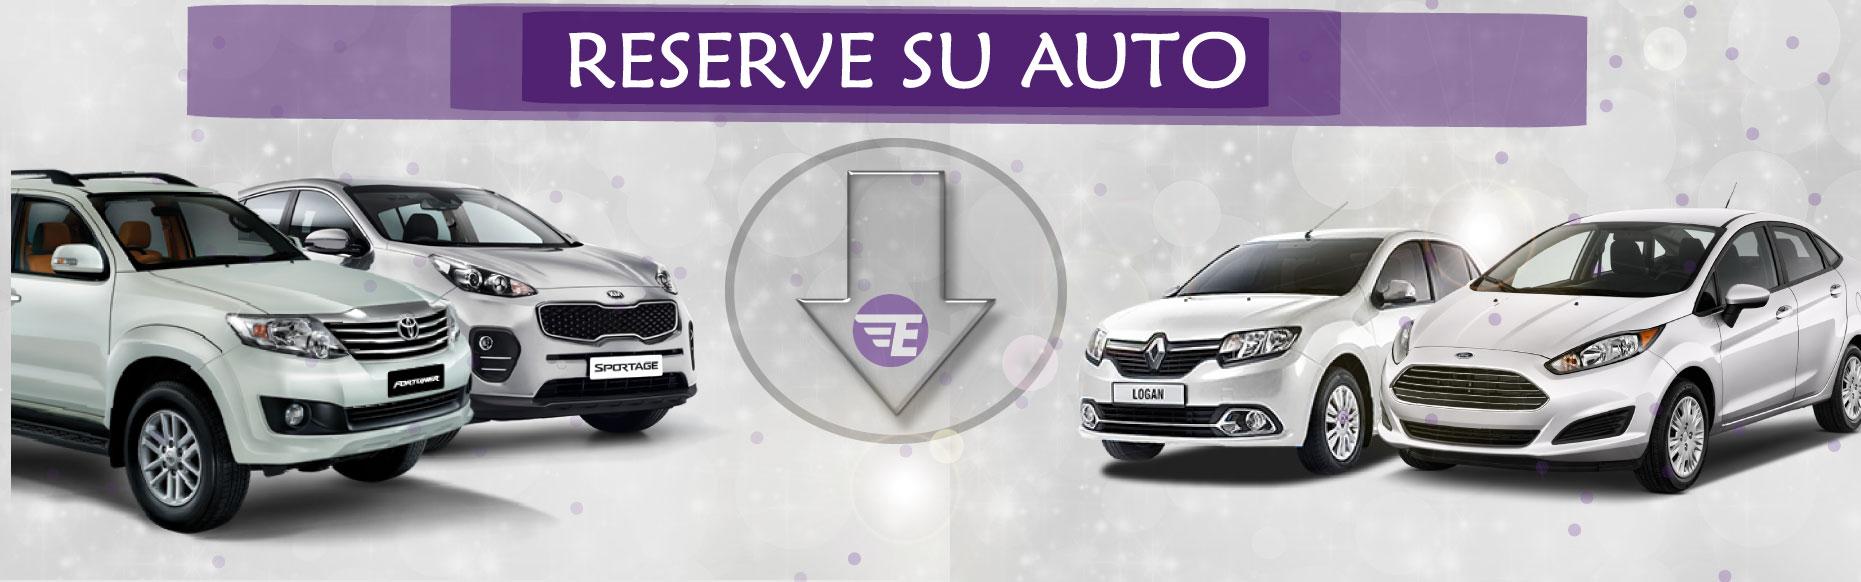 Fácil alquiler de carros en Montería